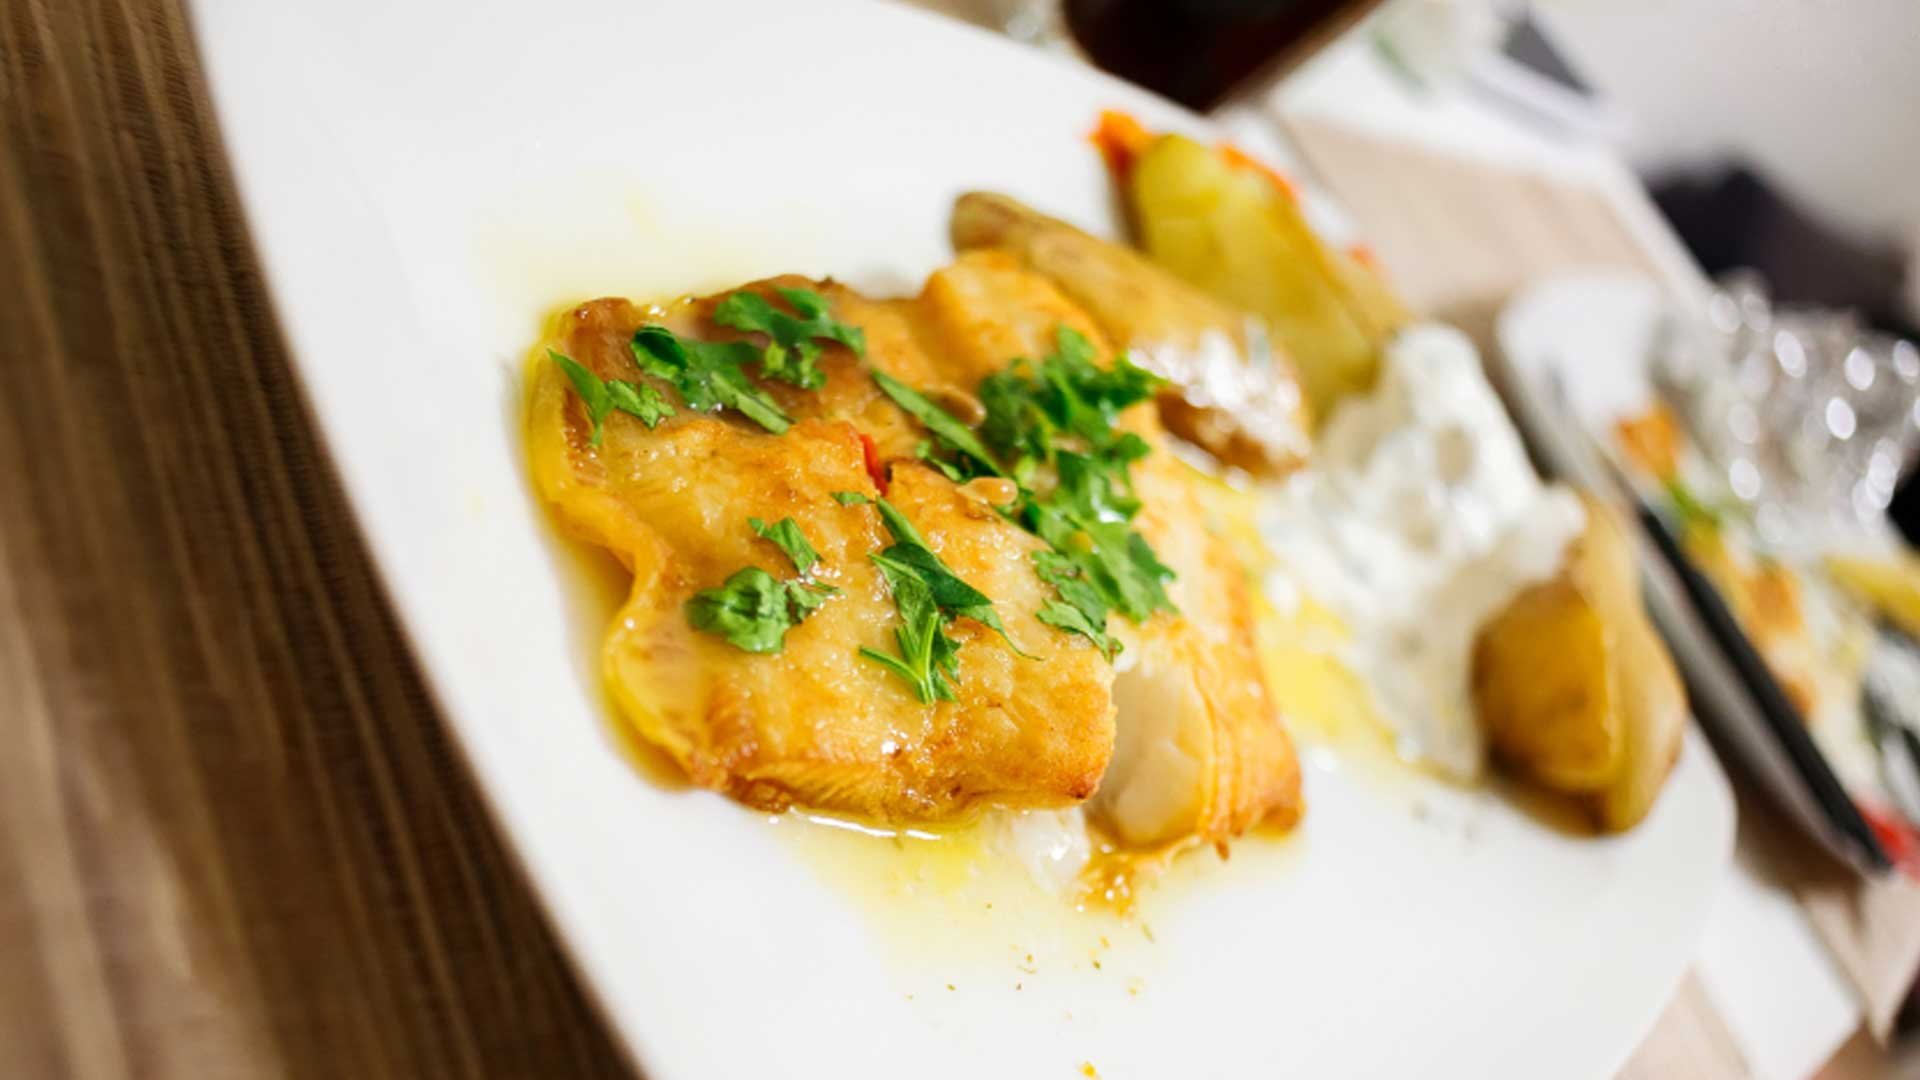 SuperFood halibut recipes: Tomato and White Wine Braised Halibut